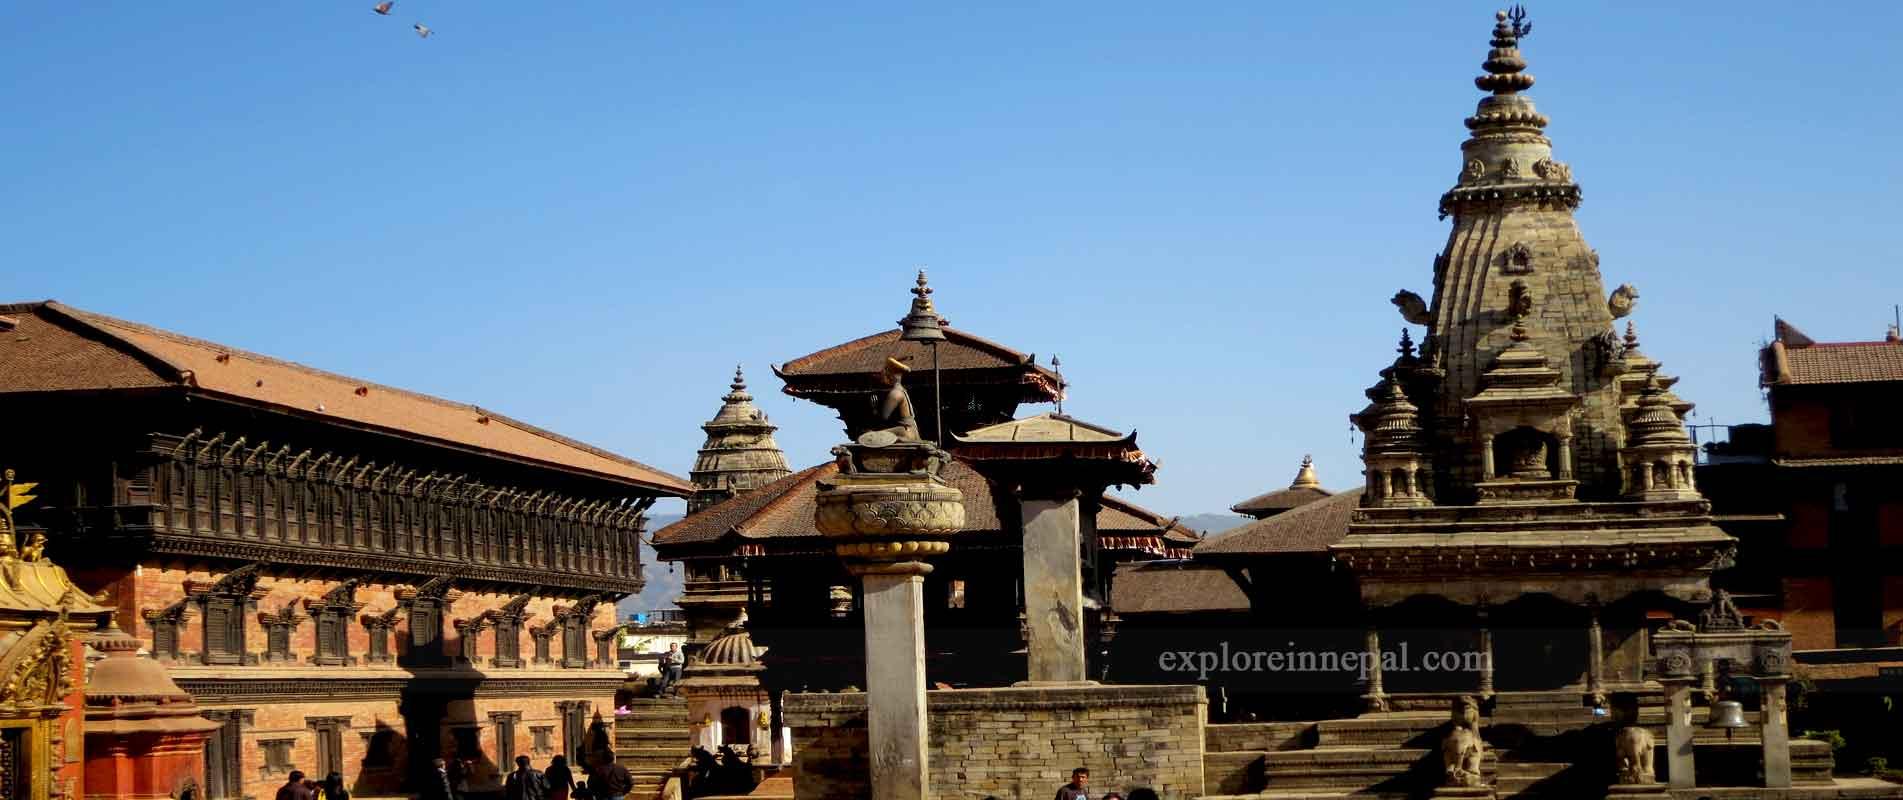 bhaktapur-durbar-square-tour